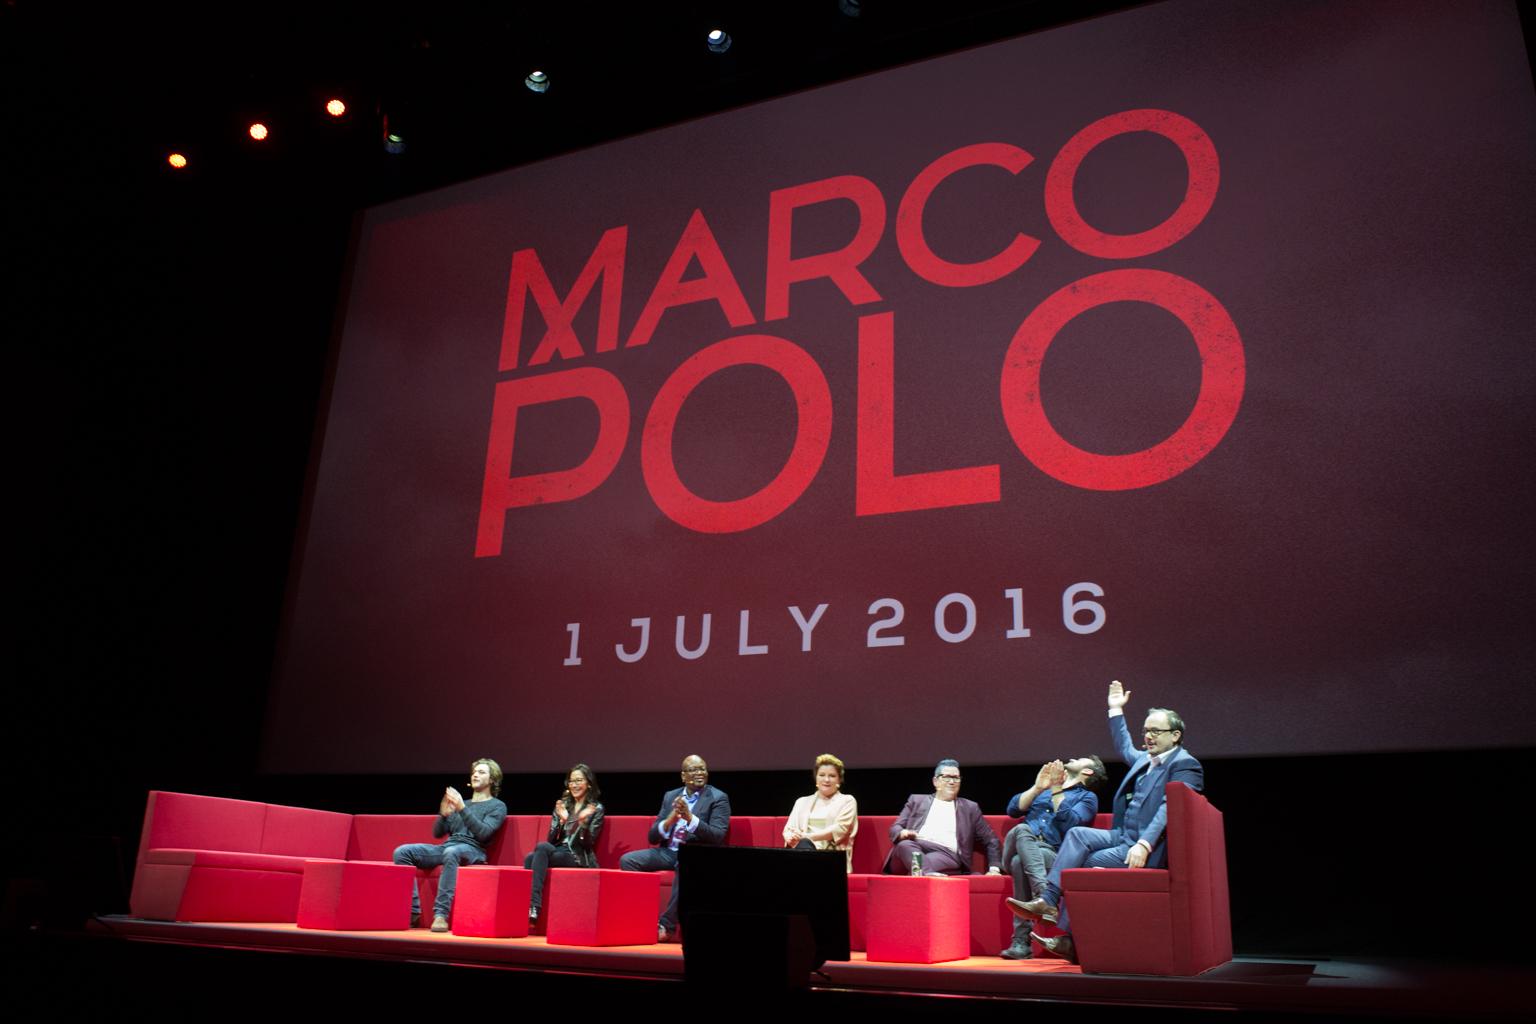 Netflix Event, Paris 11.04.2016 Returning Originals Panel (L-R) Lorenzo Richelmy, Michelle Yeoh, Tituss Burgess, Kate Mulgrew, Lea Delaria, Charlie Cox, moderator Chris Hewitt